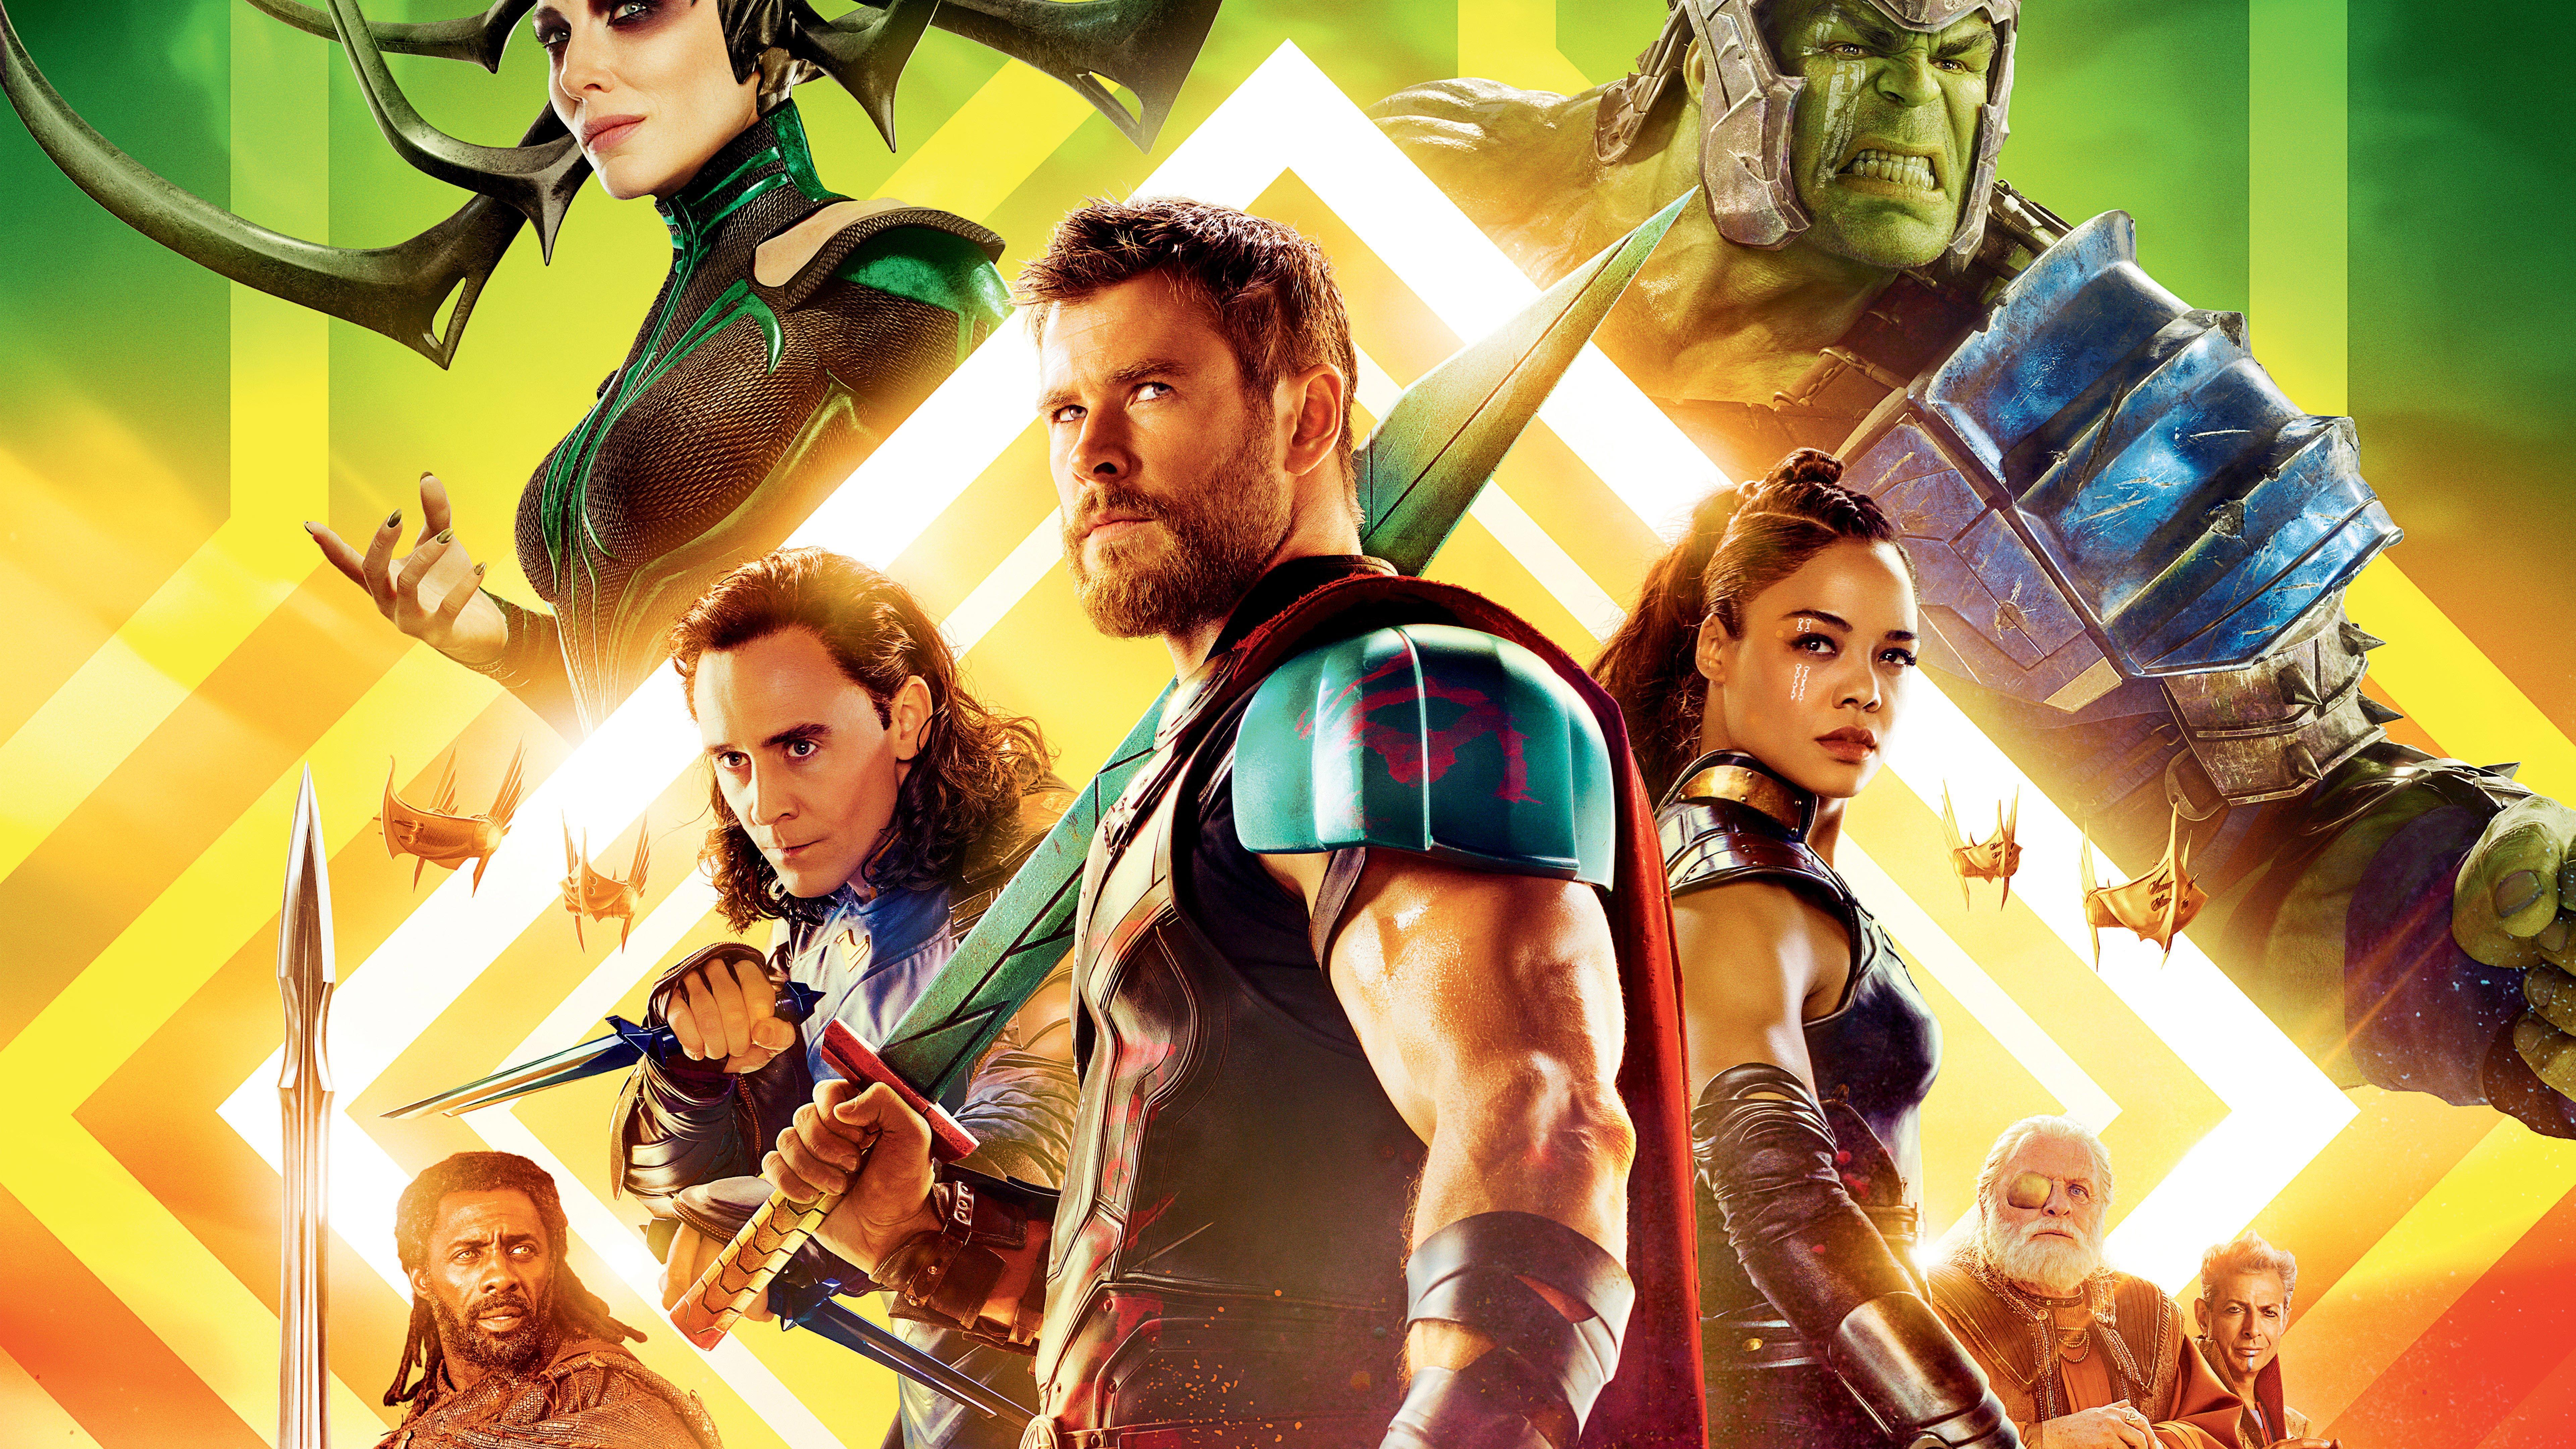 Thor Ragnarok Movie Poster Wallpapers Top Free Thor